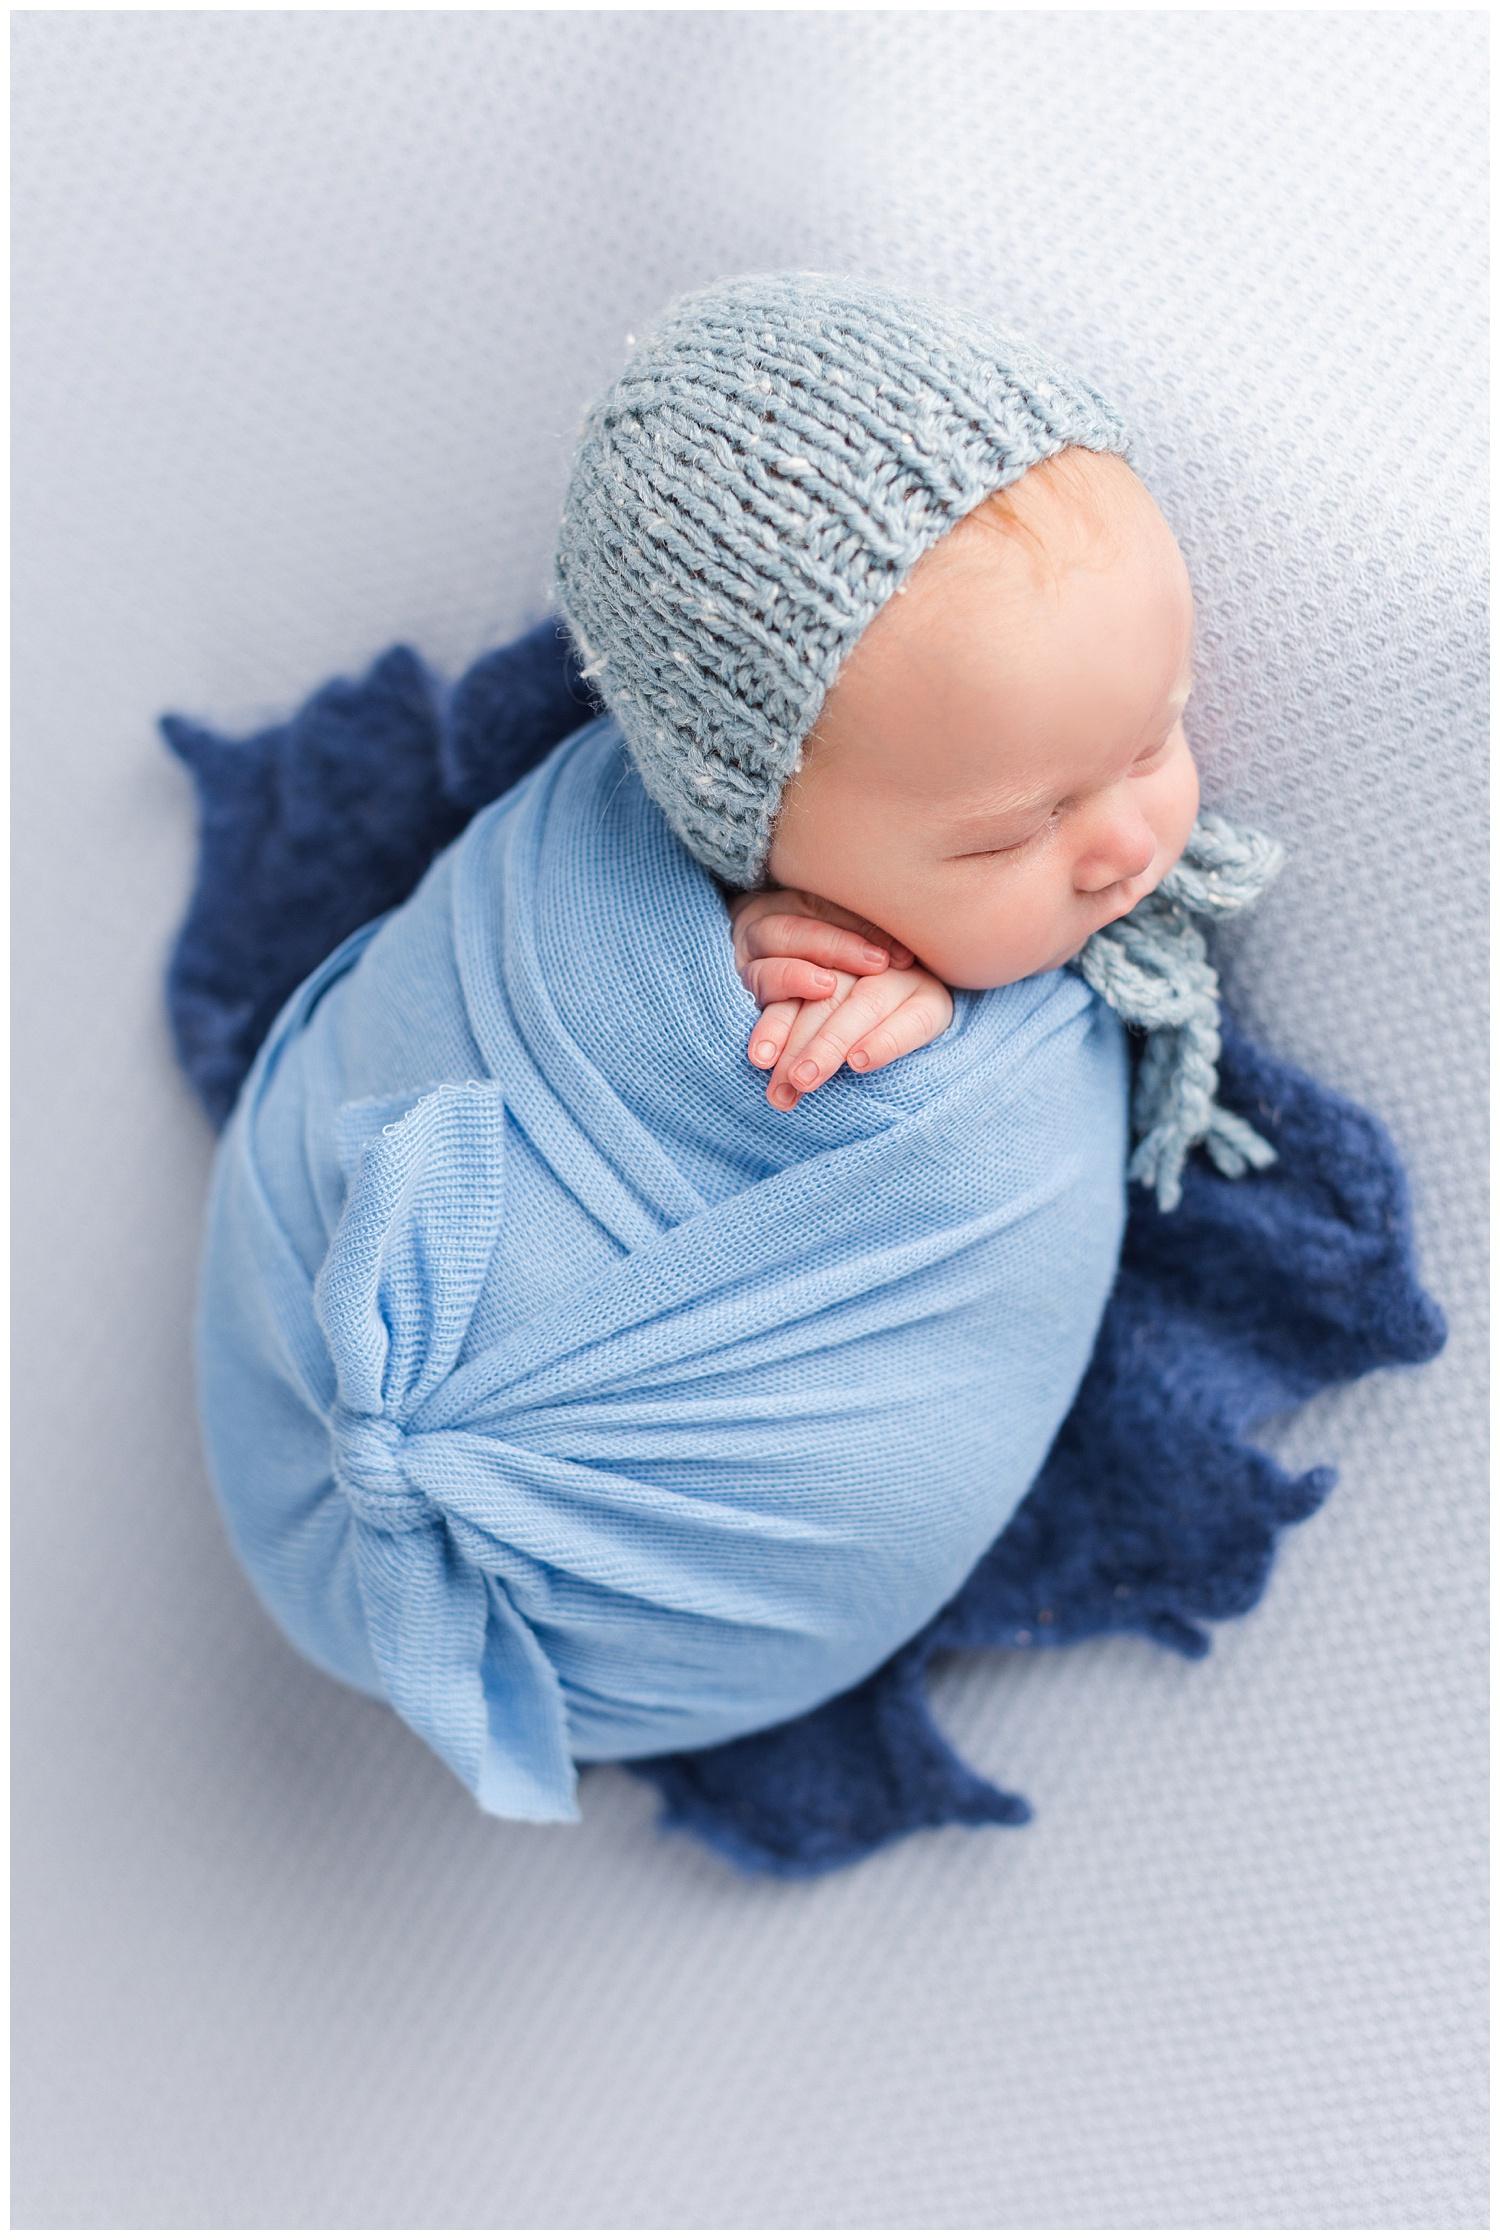 Newborn baby Luka wrapped in shades of blue   CB Studio